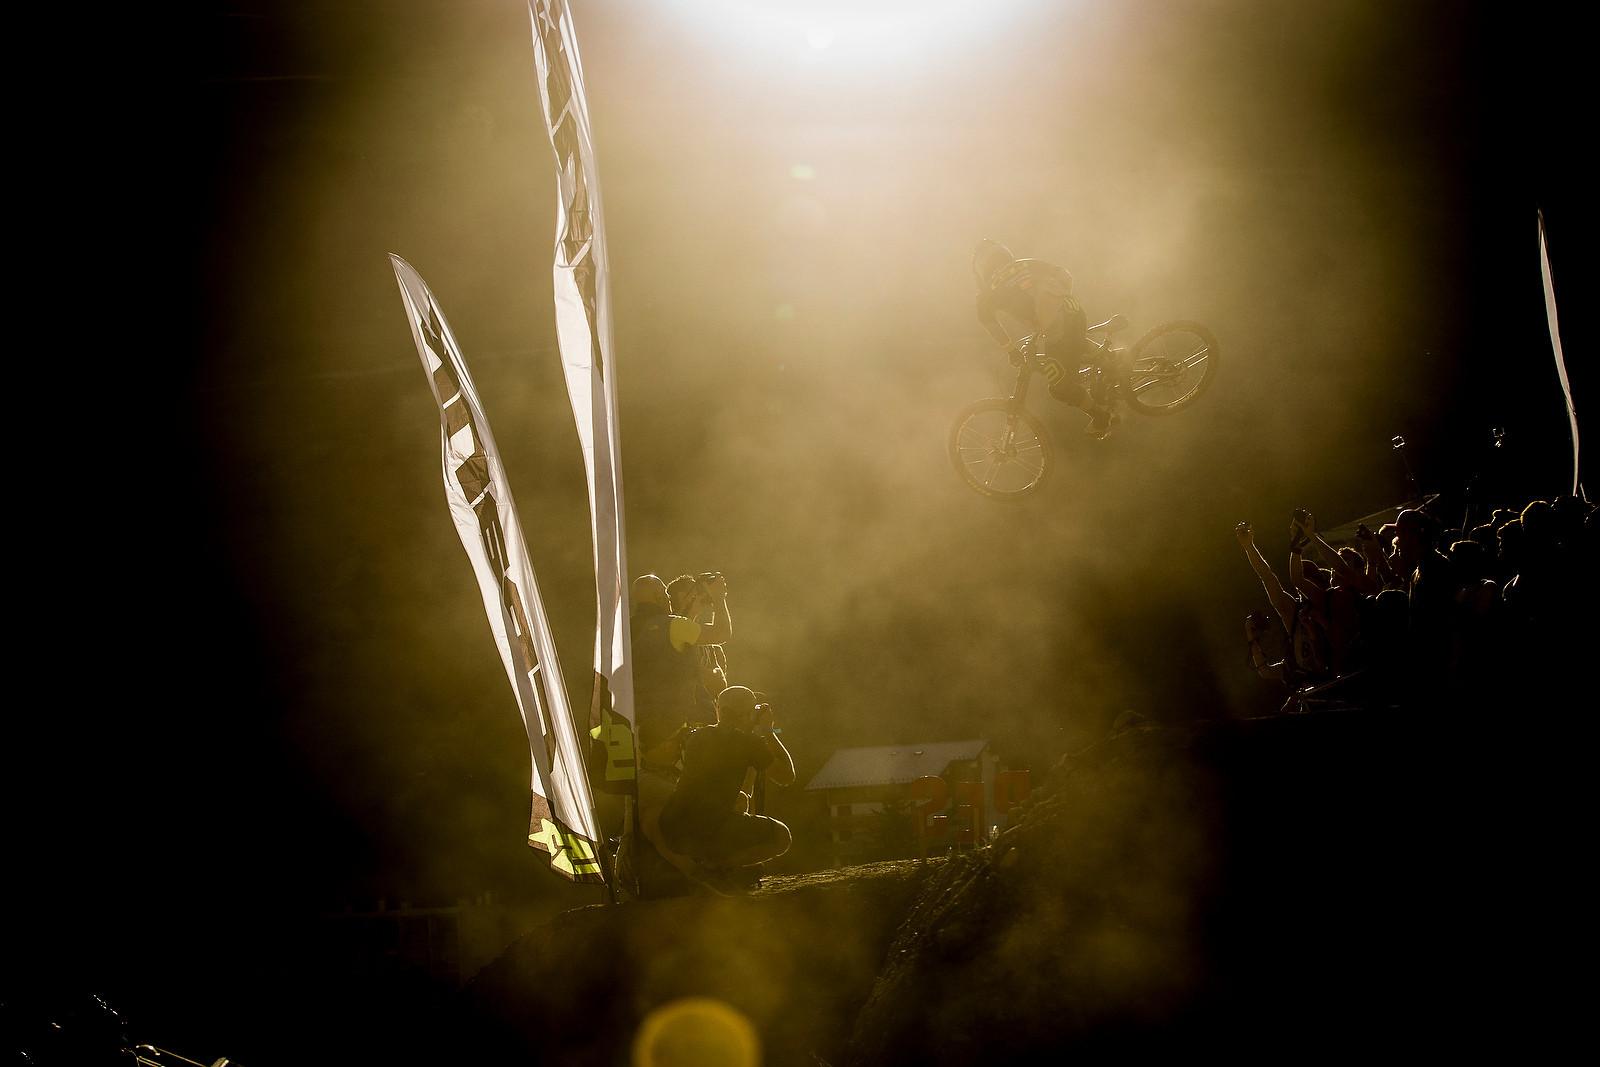 Bernardo Cruz, WINNER - Whip Off European Champs, Crankworx L2A - Whip Off European Champs, Crankworx L2A - Mountain Biking Pictures - Vital MTB